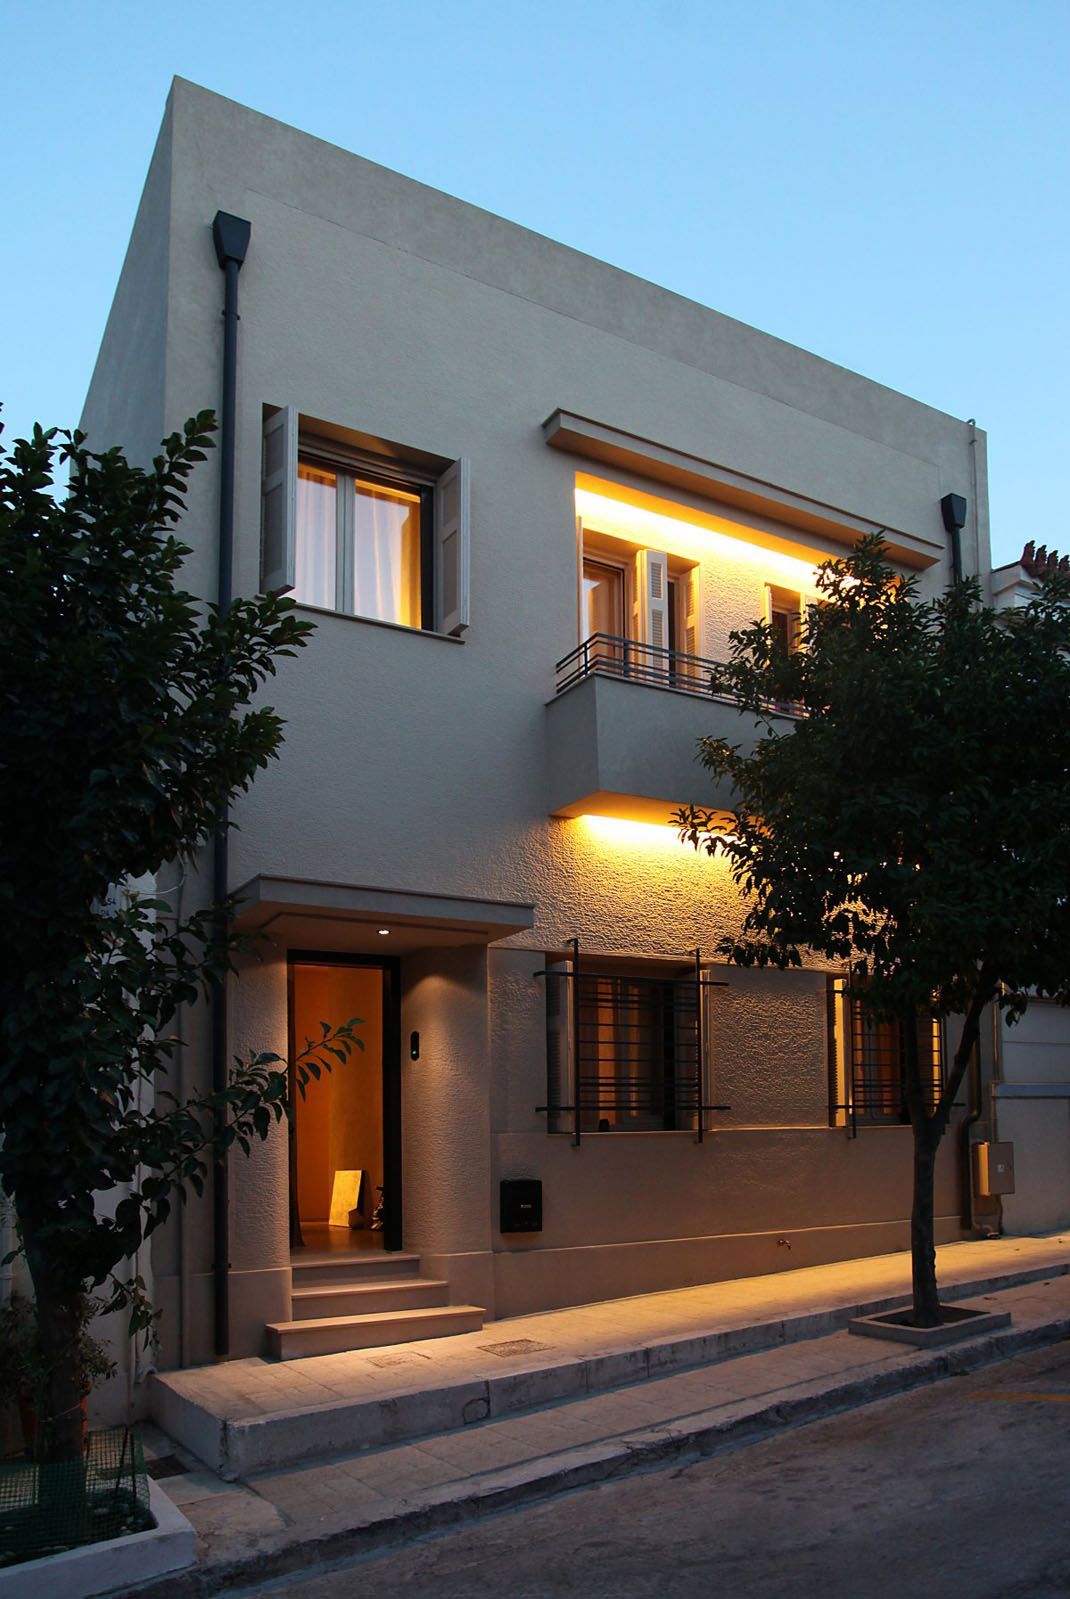 Acropolis View House - Athens, Greece | Architecture | Pinterest ...